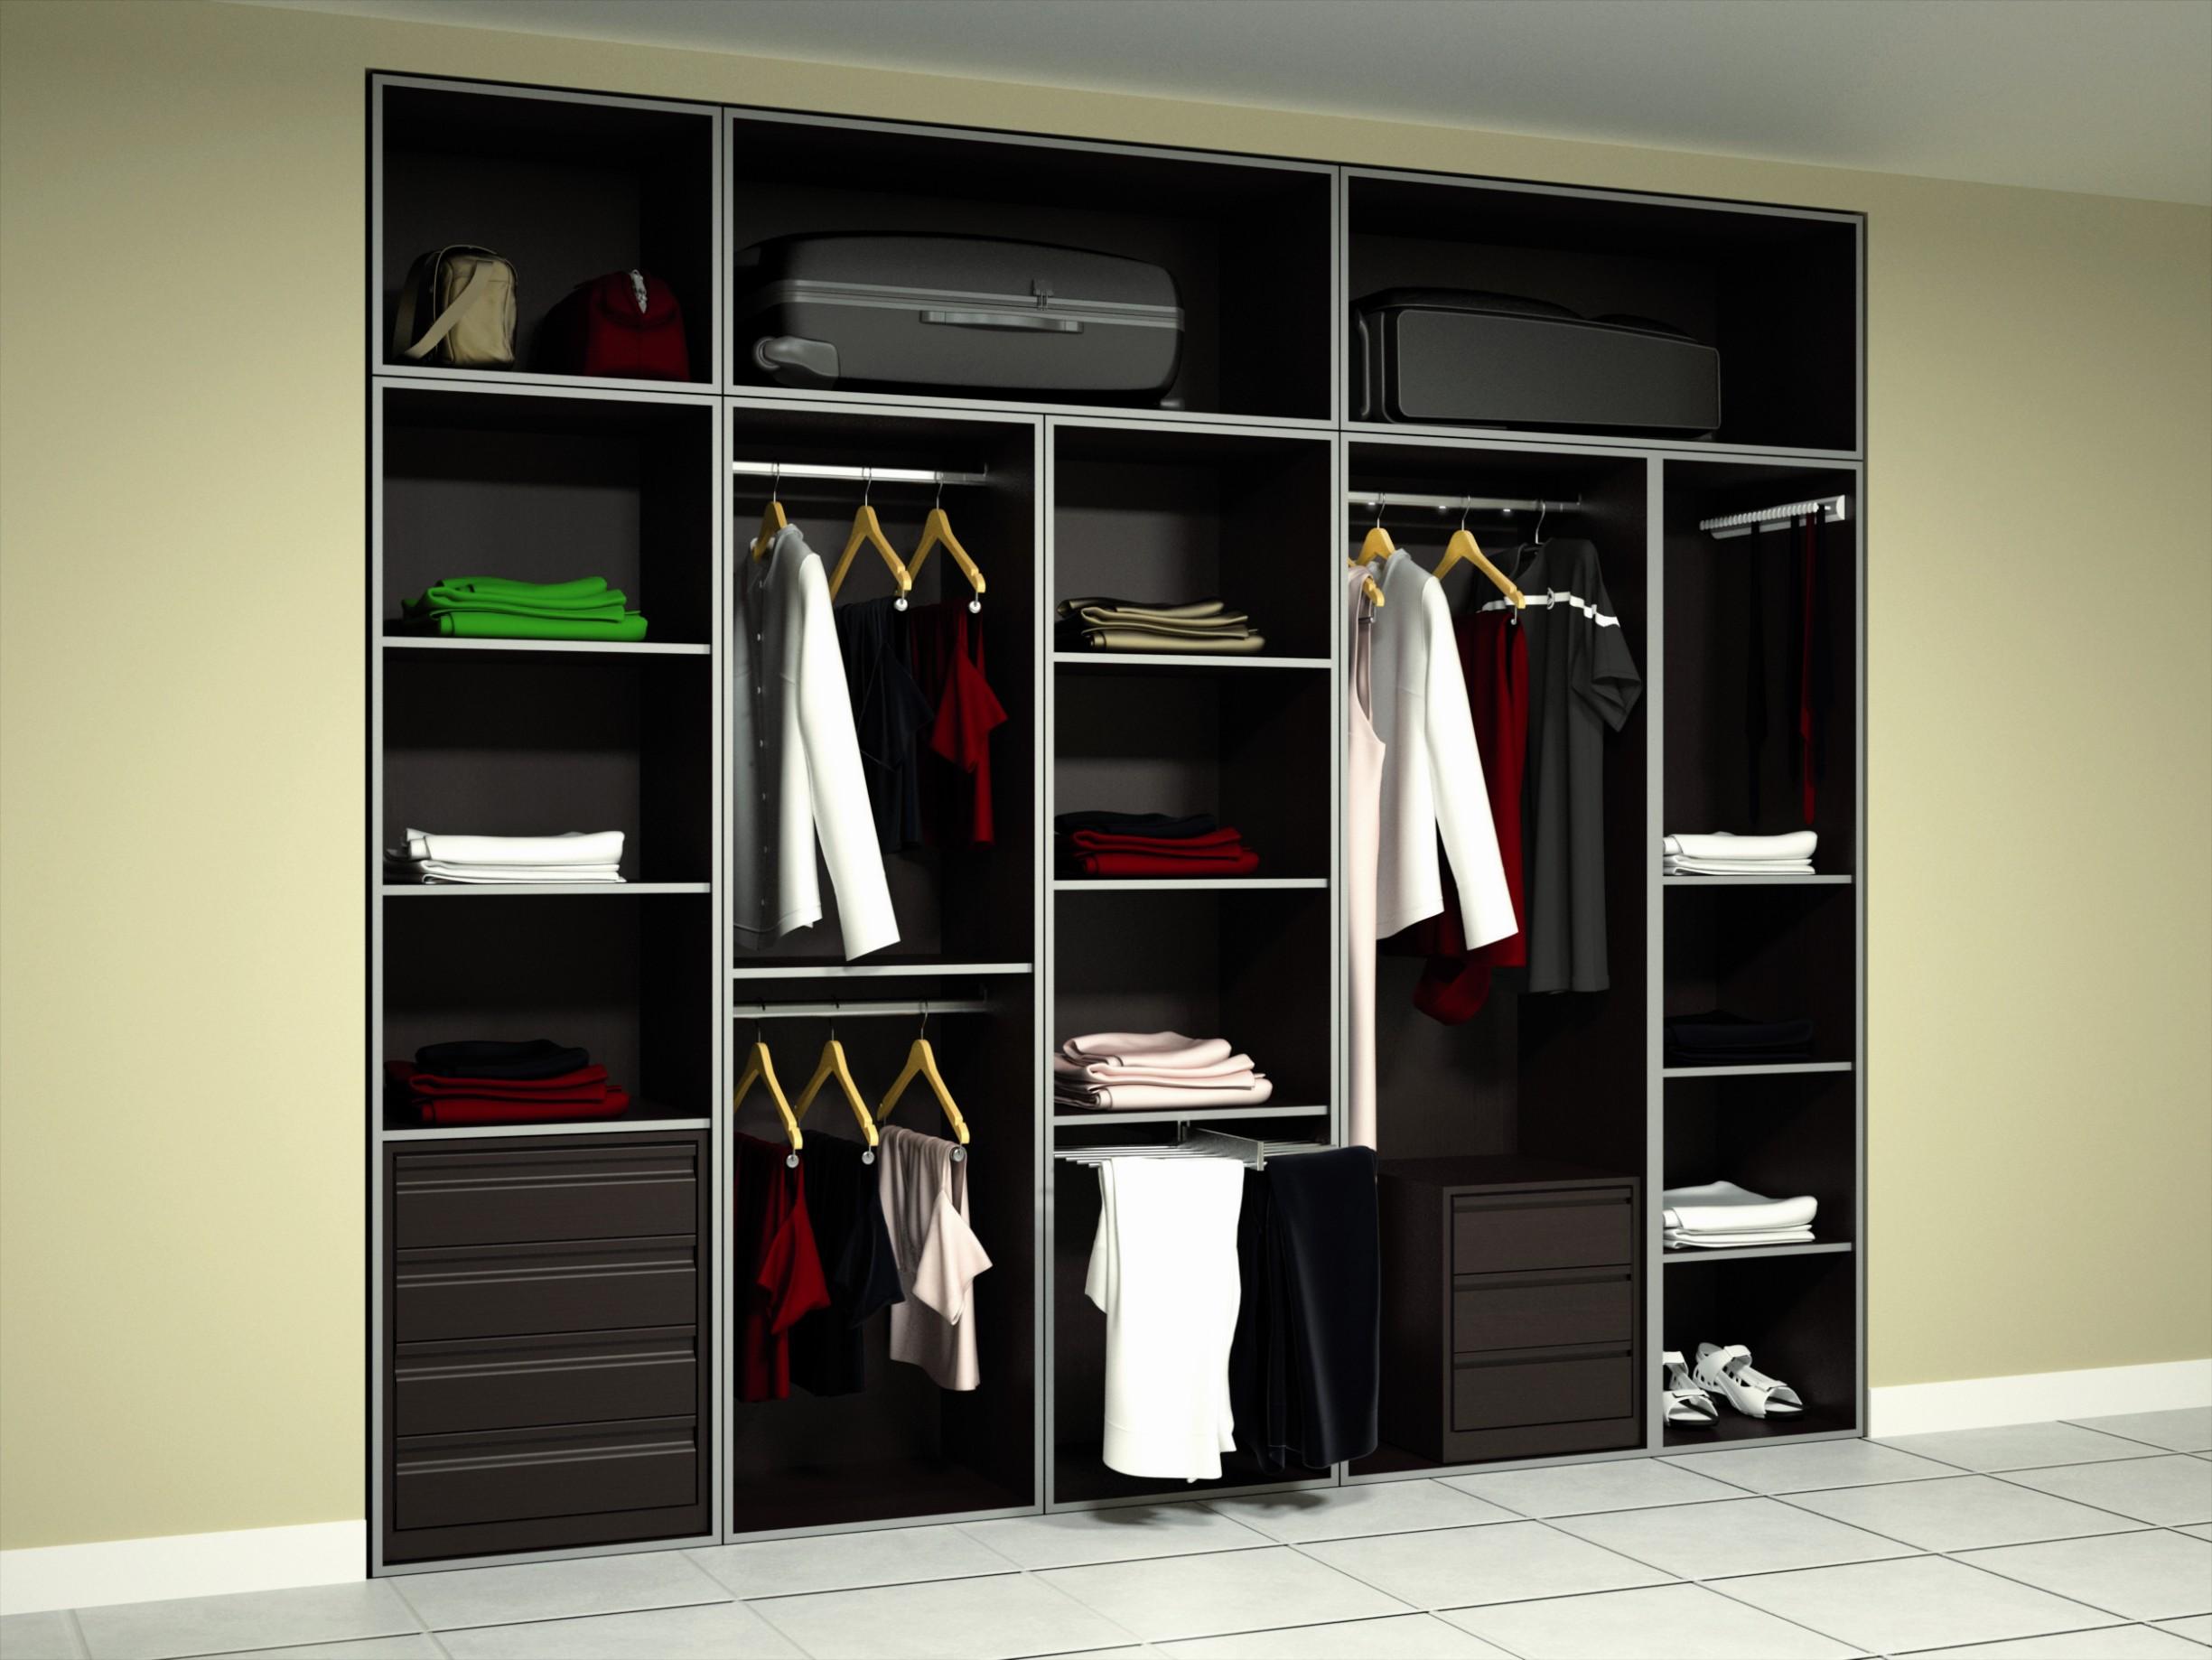 Frentes e interiores de armario nesu reformas - Armarios empotrados interiores fotos ...